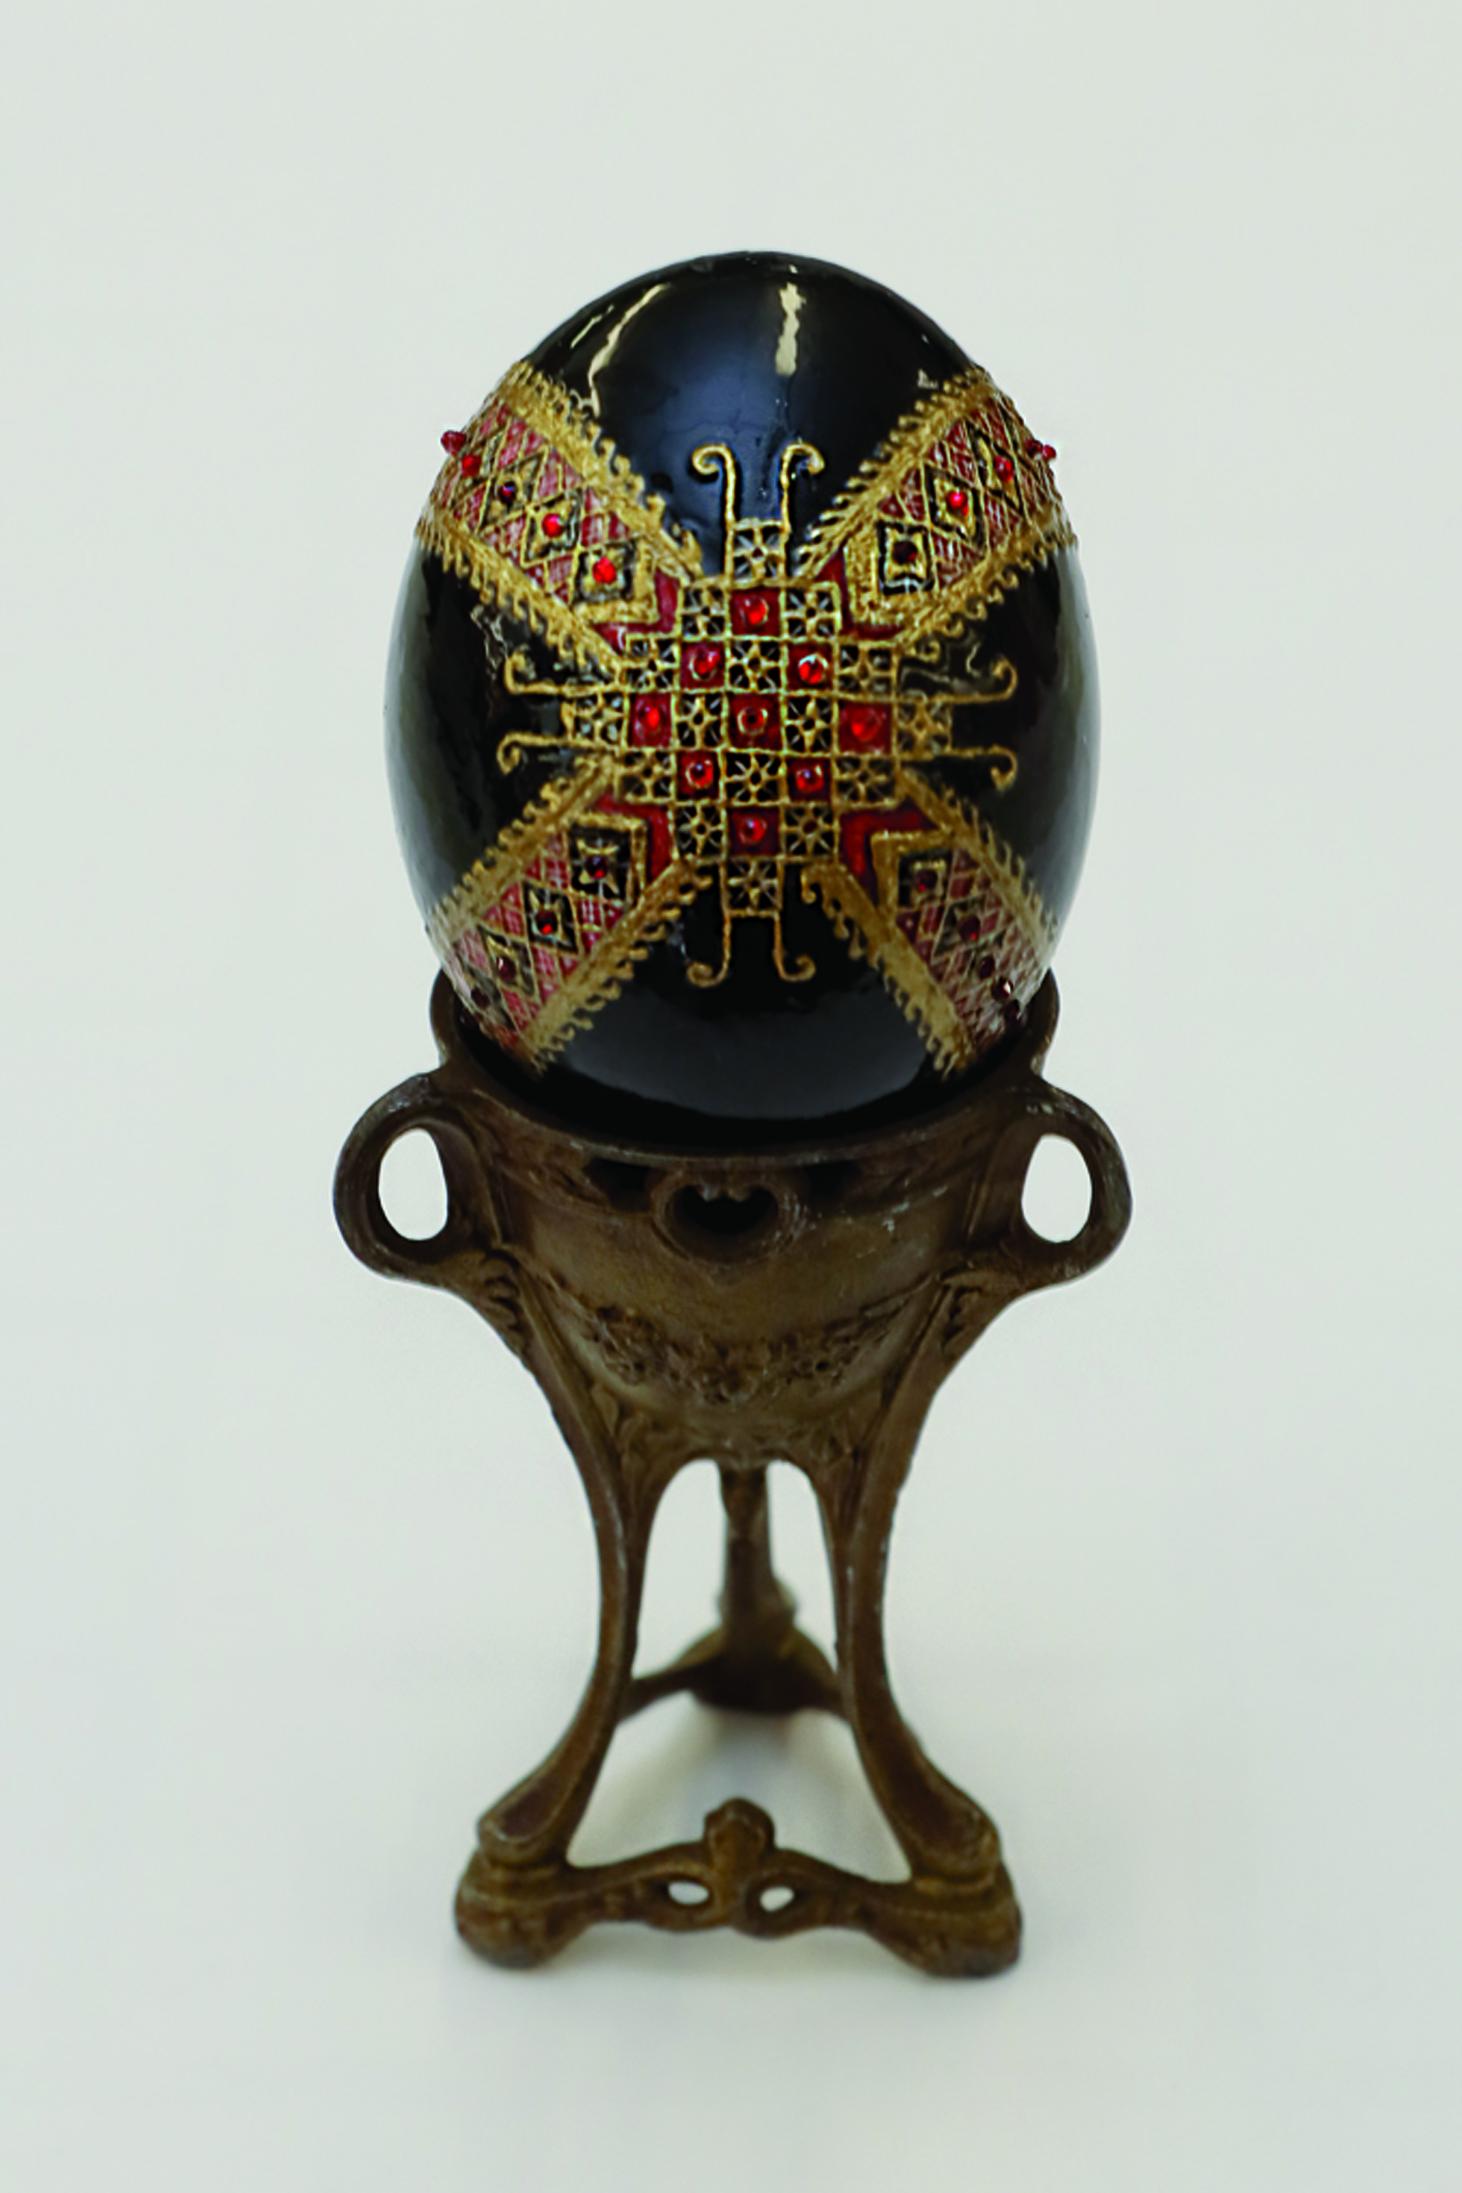 Message behind decorative Easter Egg